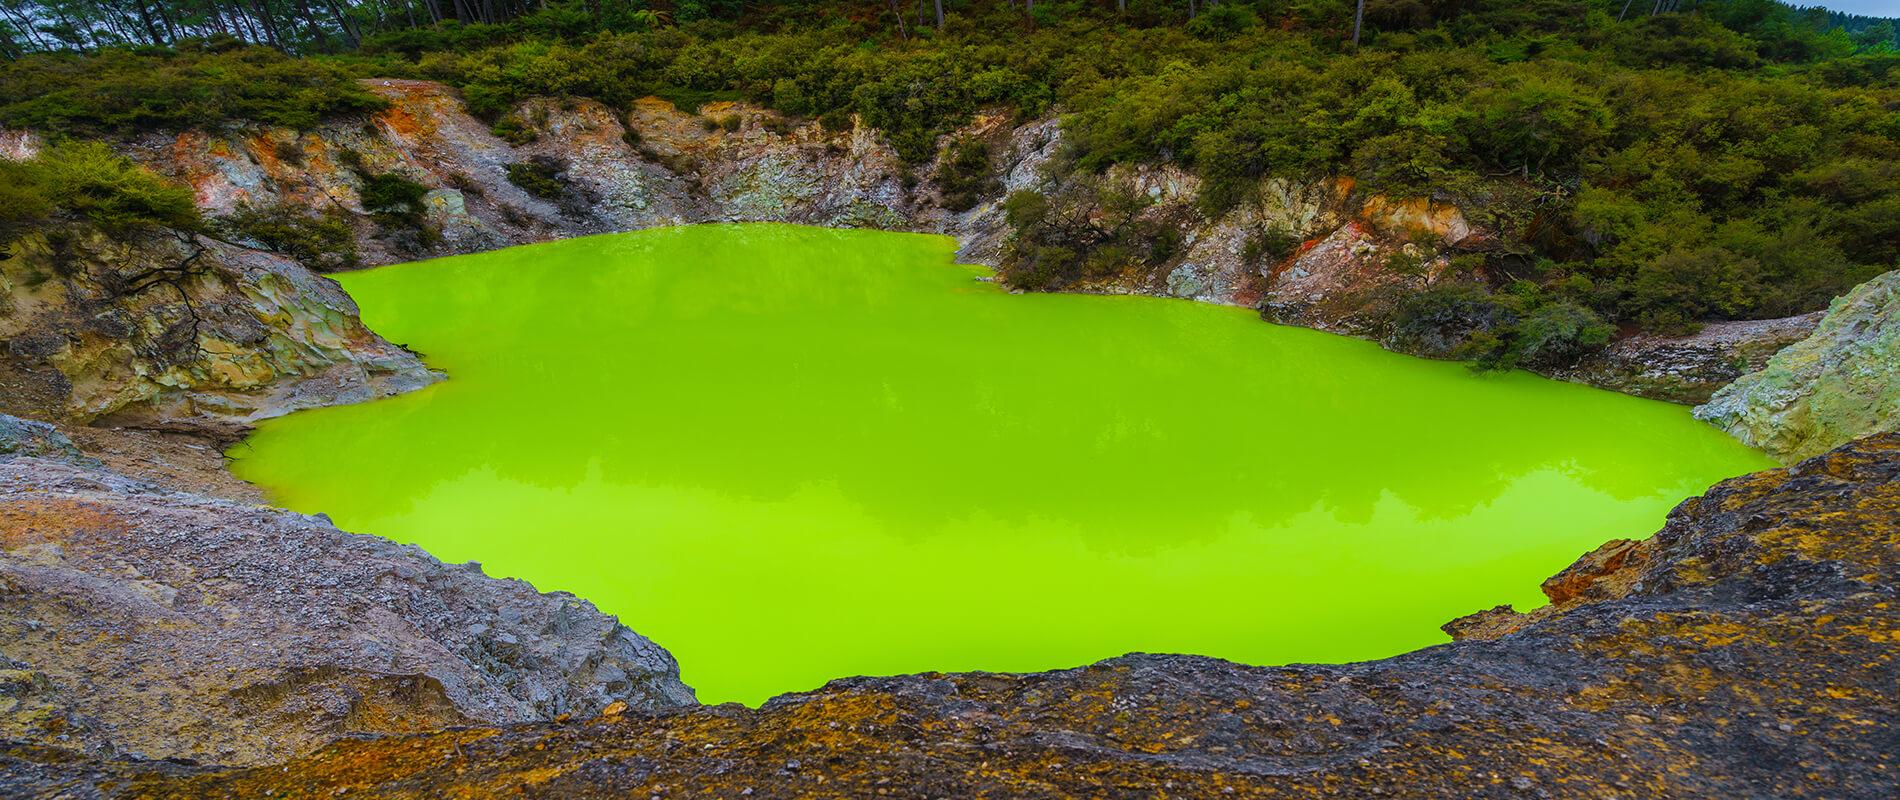 Devil's Bath, lo stagno verde acido della Nuova Zelanda